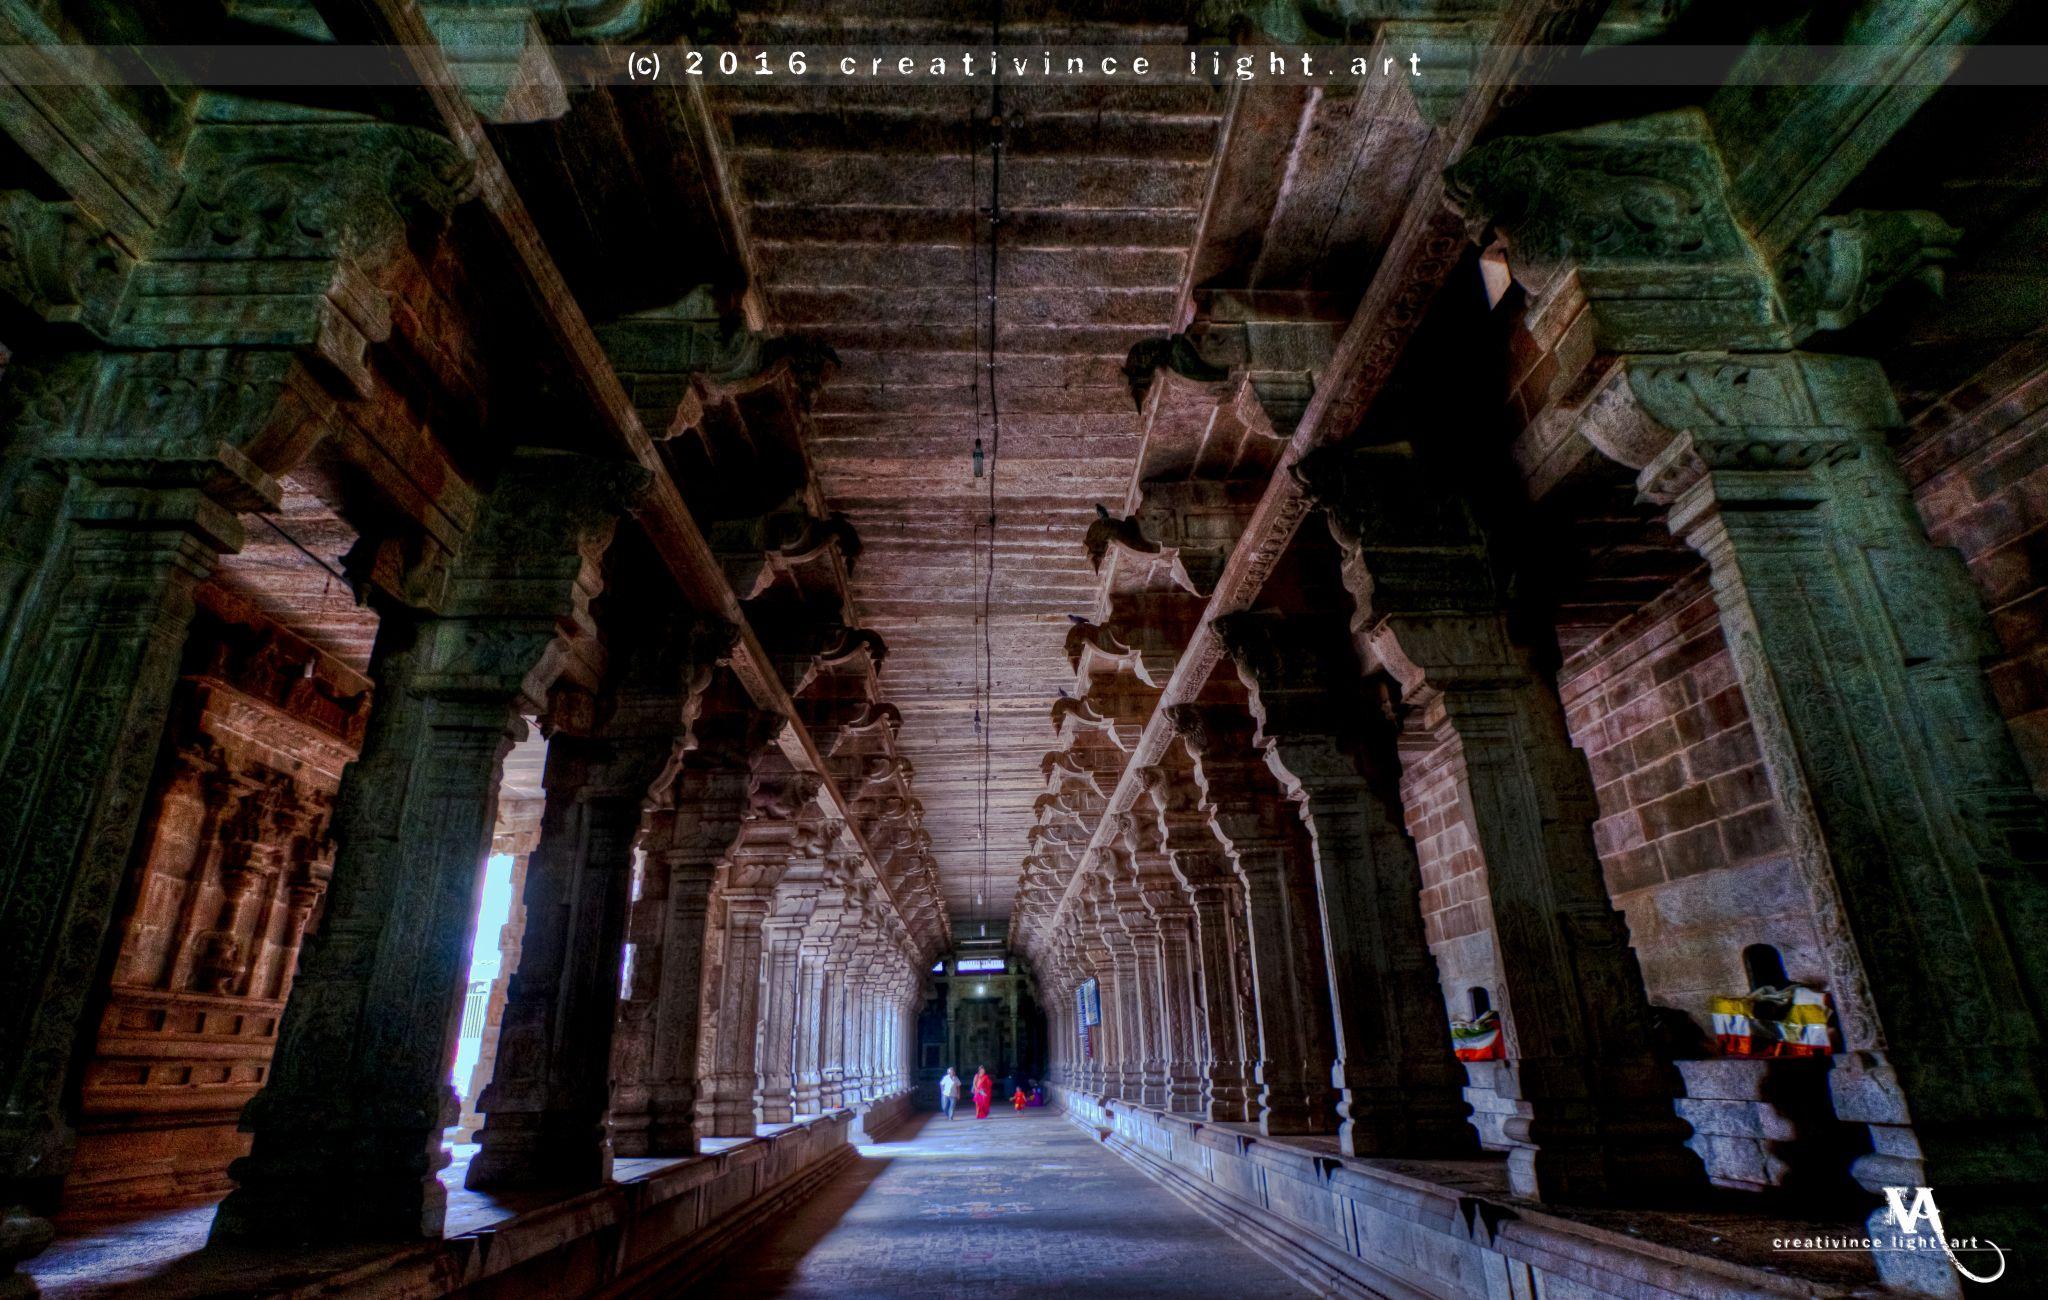 Ekambaranathar / Ekambareswarar Temple, Kanchipuram, India